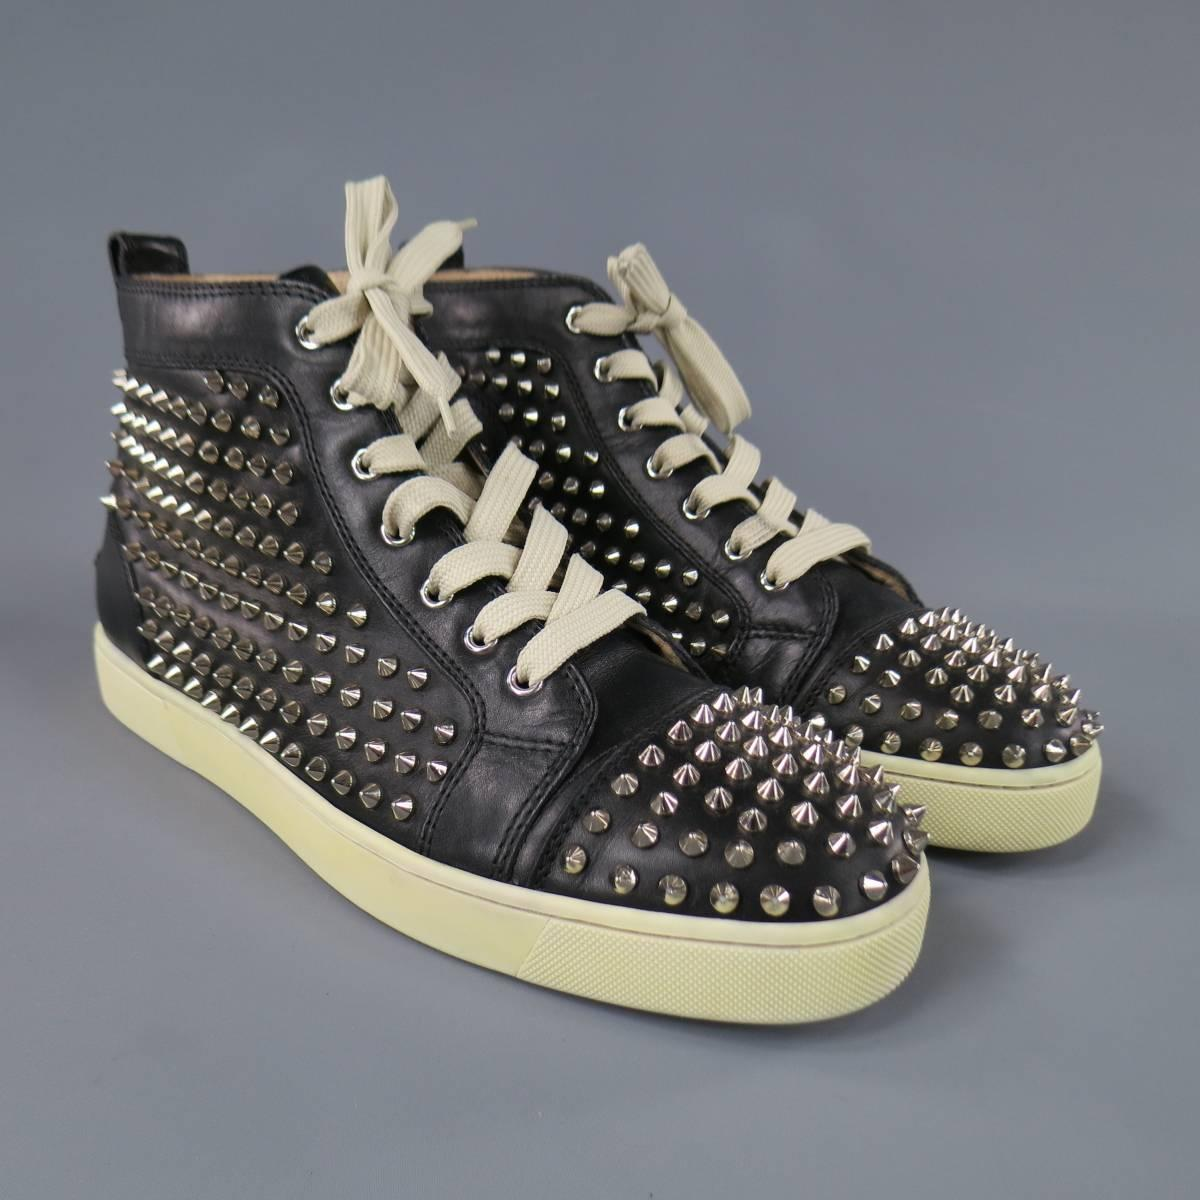 Men S Christian Louboutin Size 11 Black Leather Silver